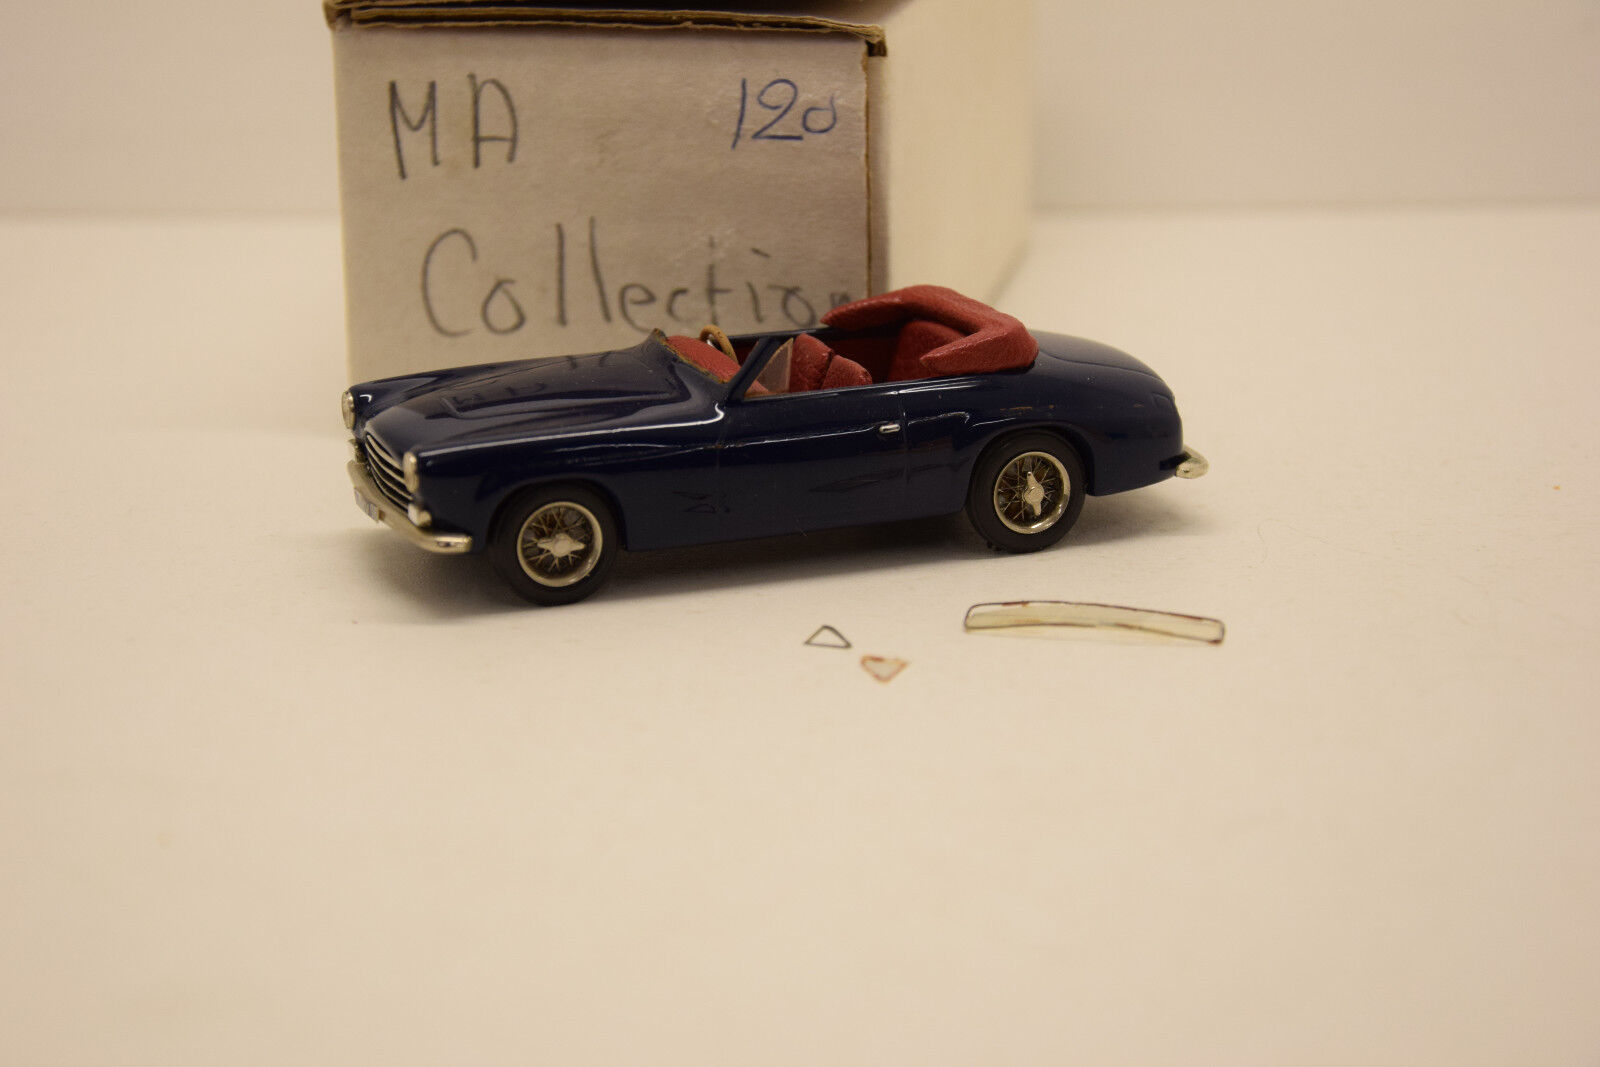 SALMSON SALMSON SALMSON 2300 S CAB. 1954 MA COLLECTION (BRIANZA) 1 43 MONTAGE USINE NEUVE BOITE 5d47c5